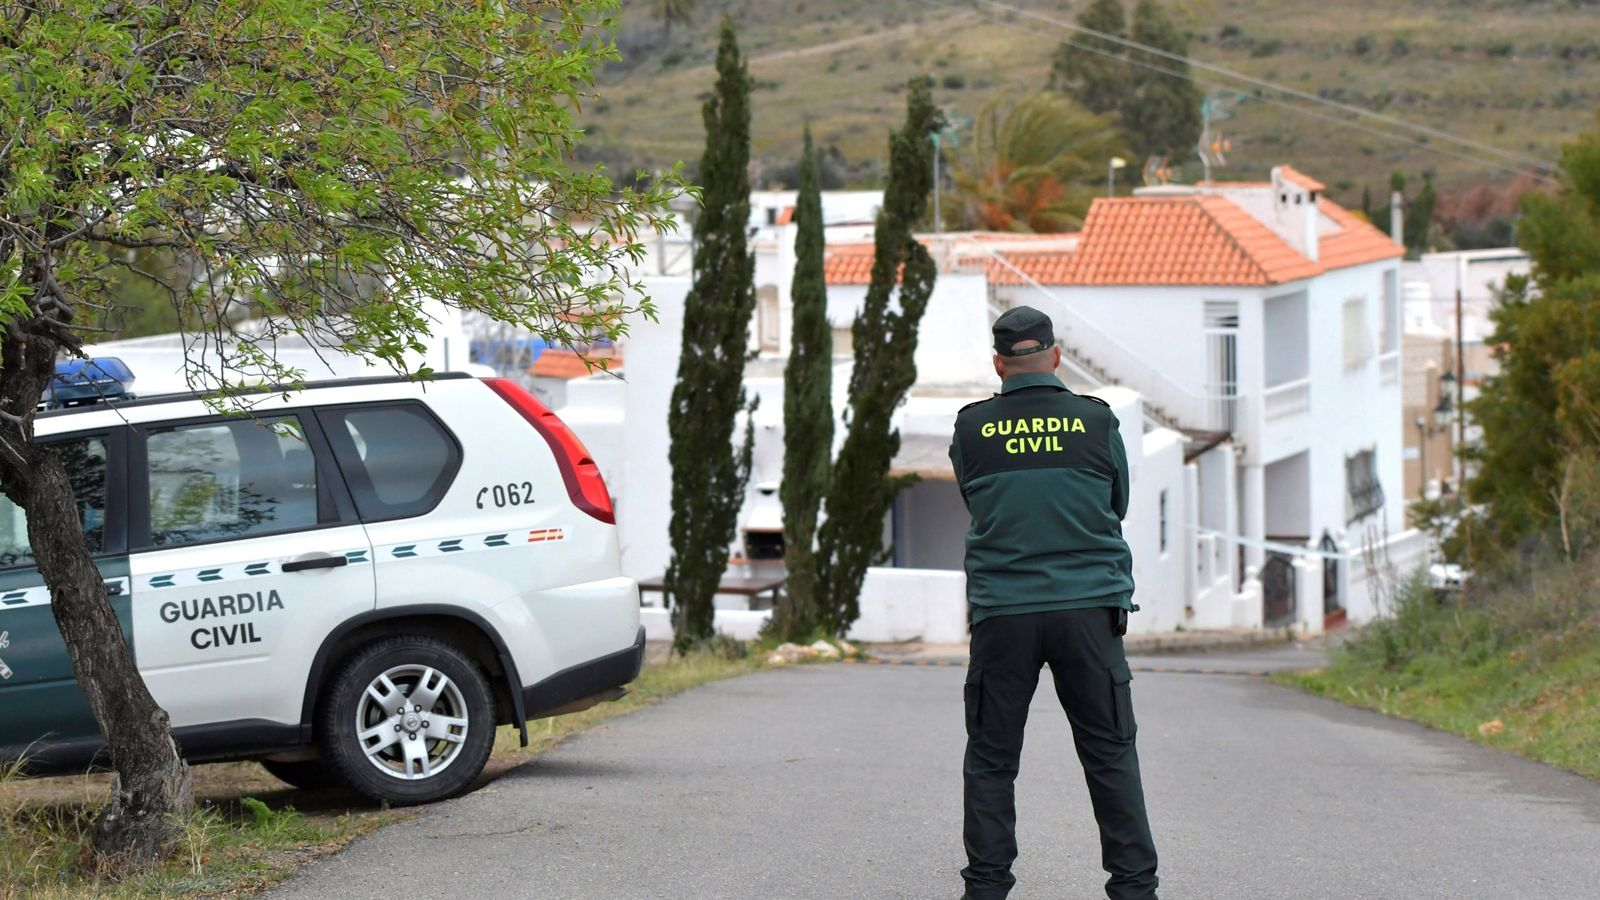 Foto: Un agente de la Guardia Civil hace guardia en la zona donde desapareció Gabriel Cruz. (EFE)